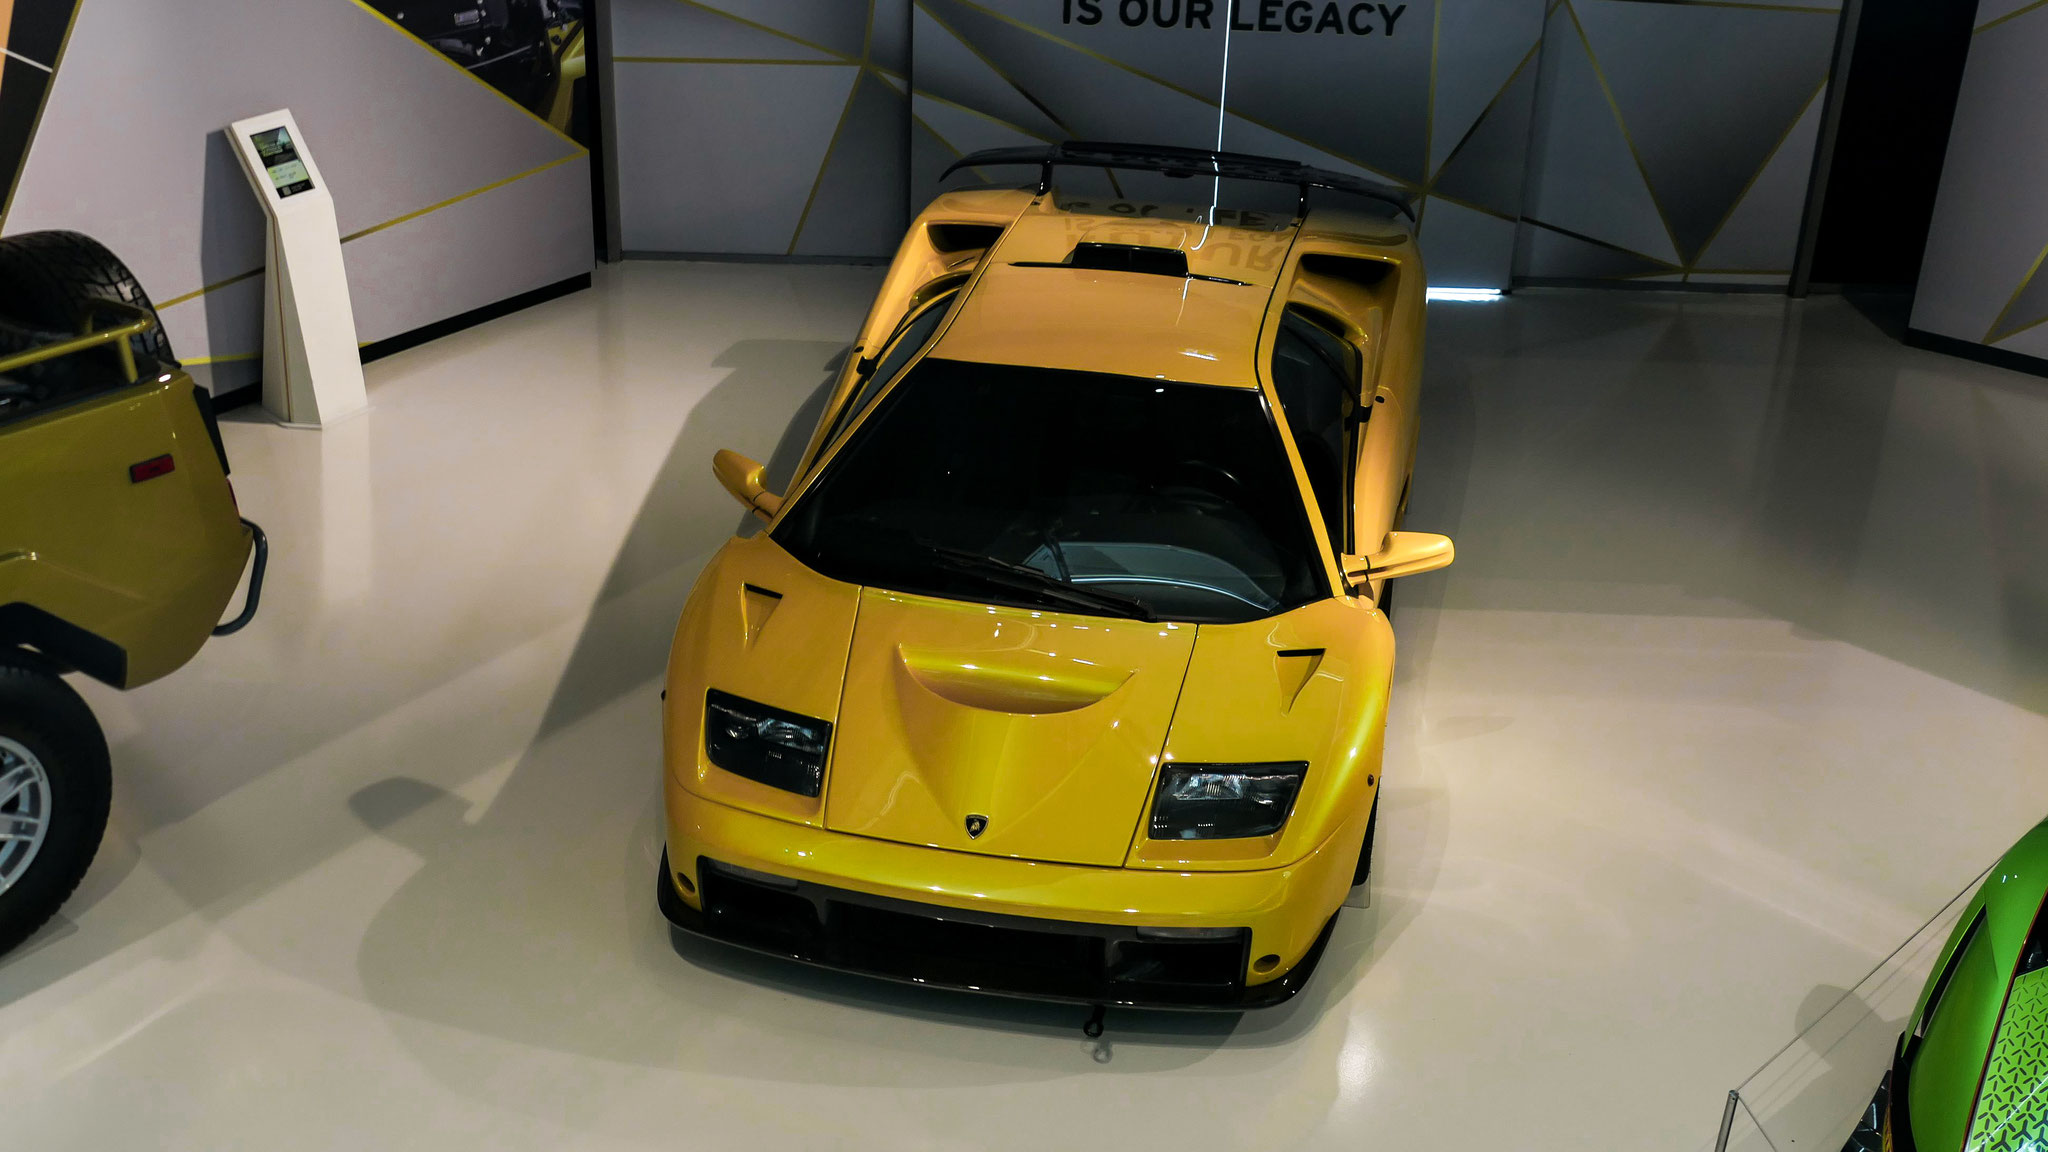 Lamborghini Diablo GT (Lamborghini Museum)